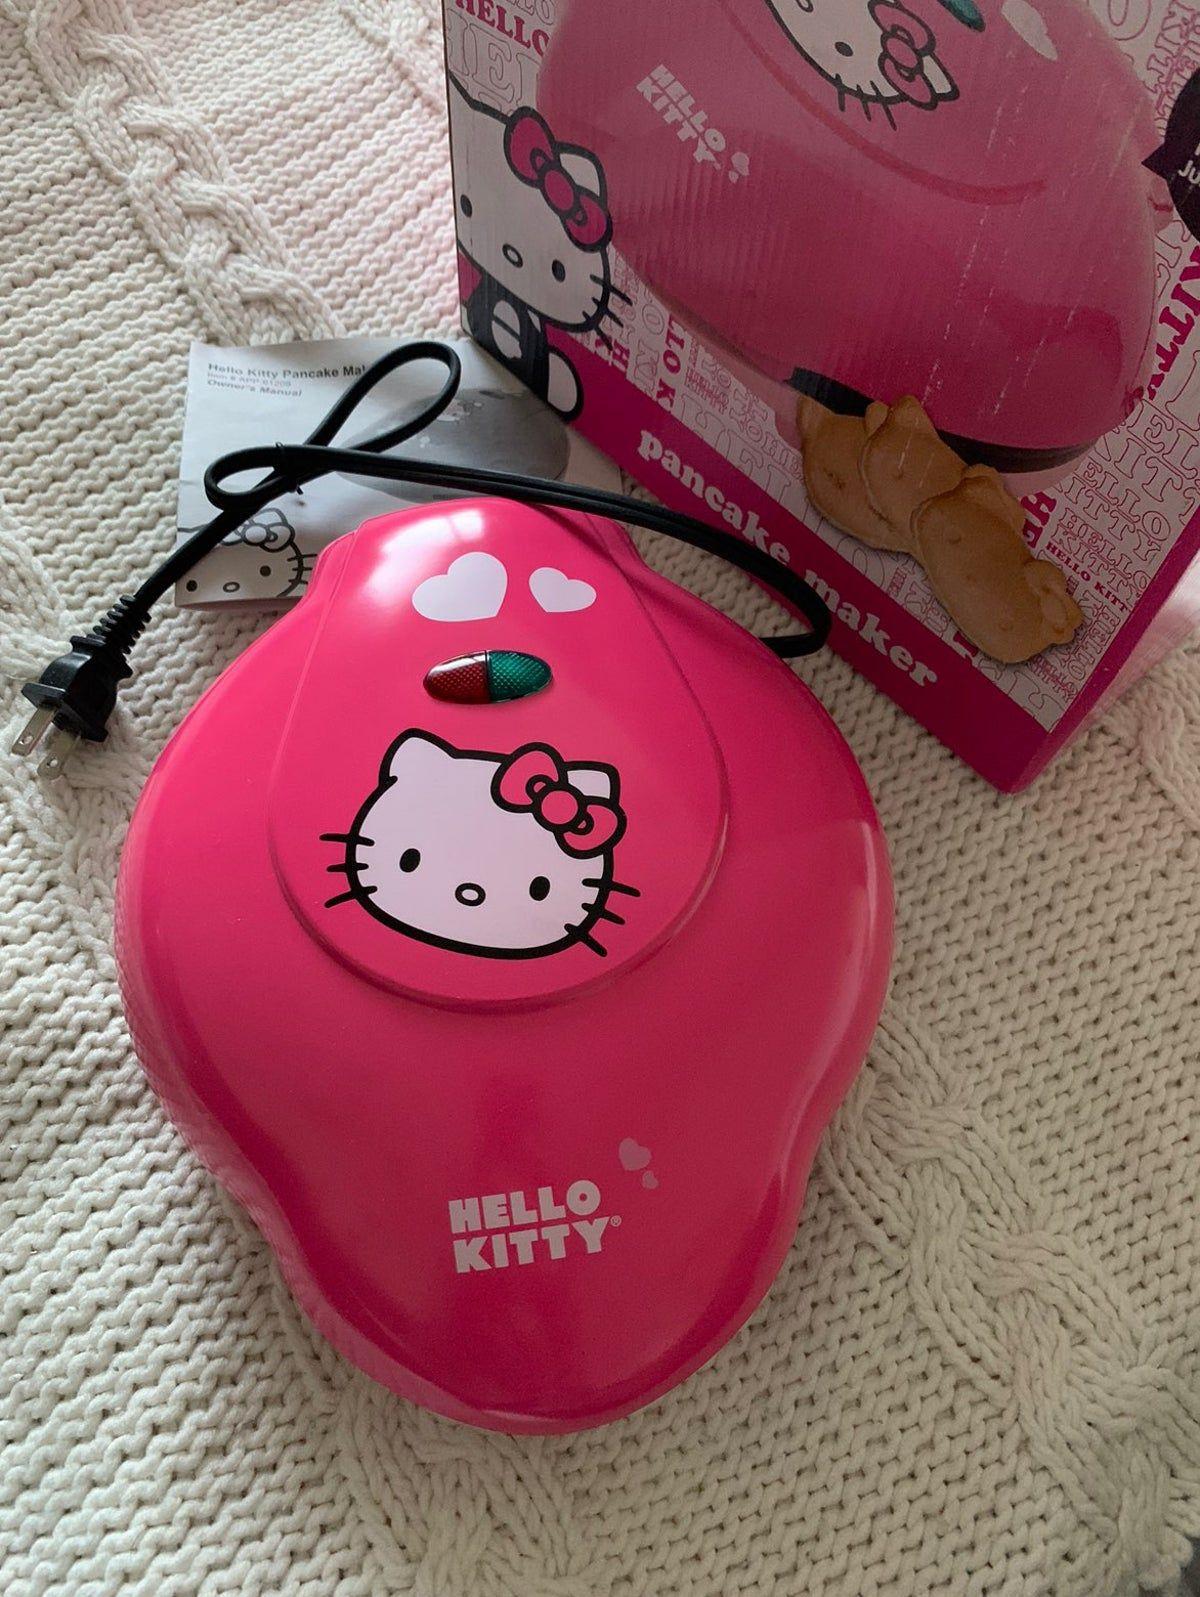 Hello Kitty Pancake Maker on Mercari